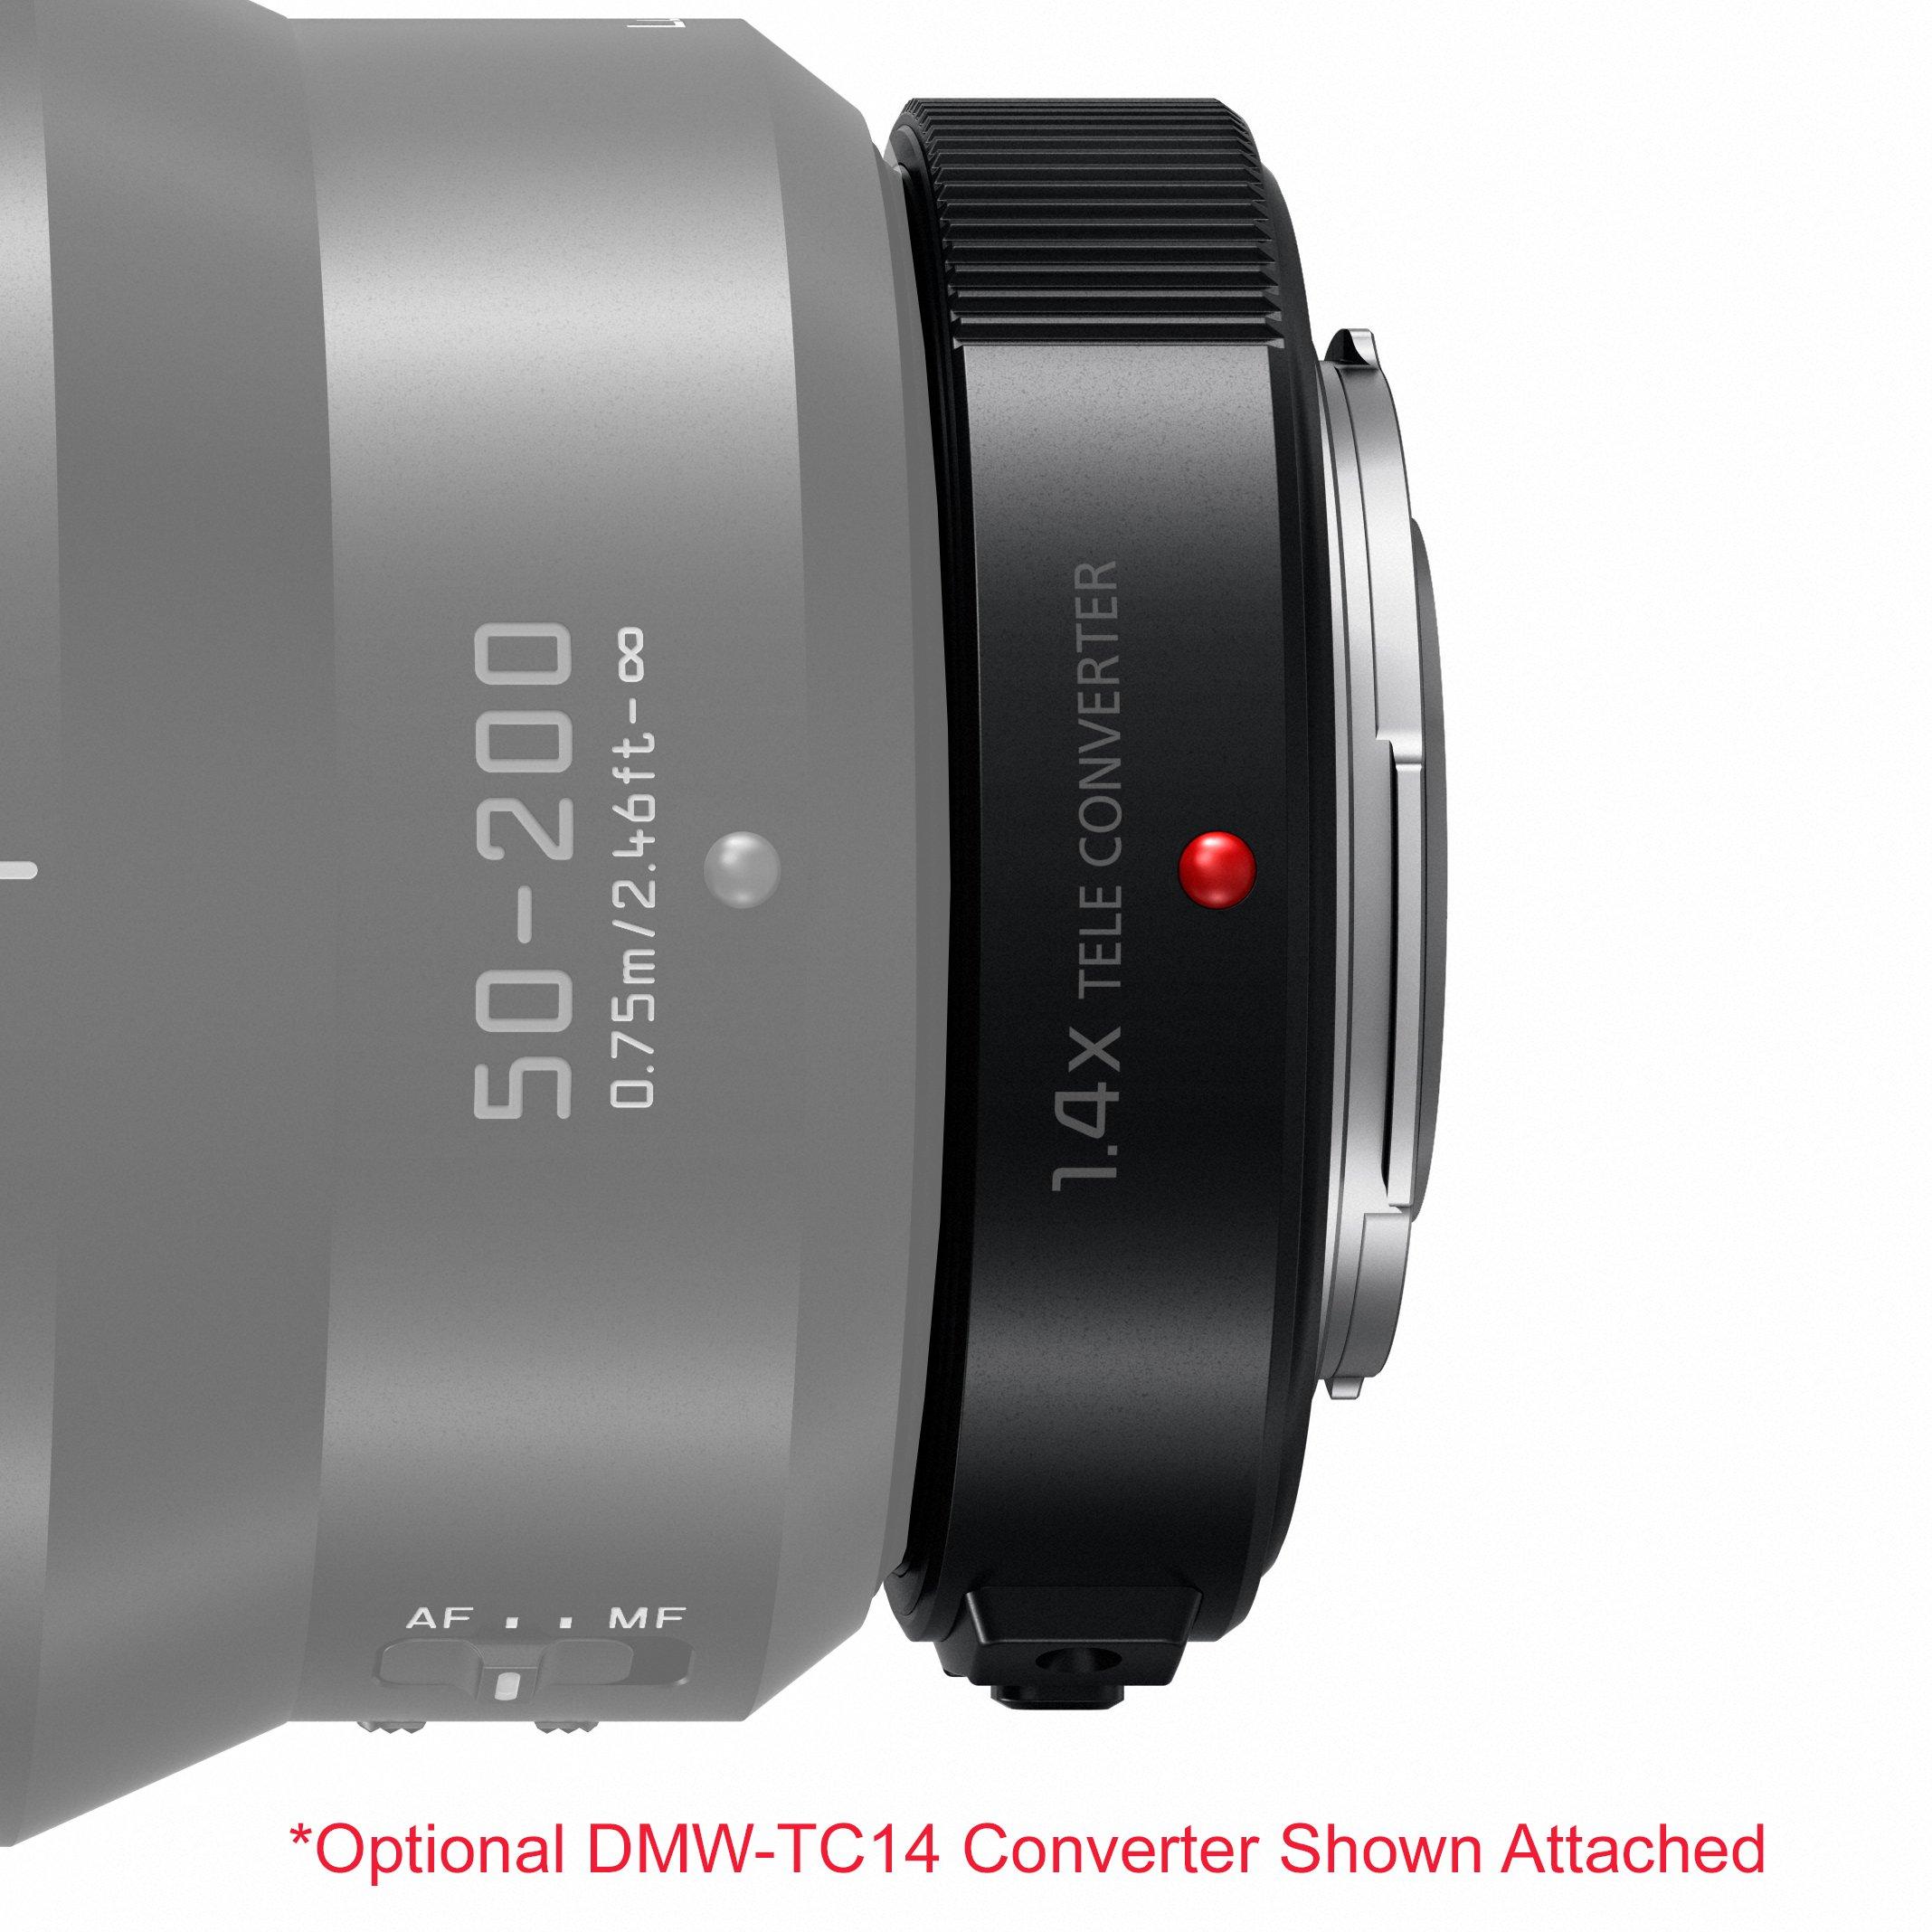 Panasonic H Es50200 Lumix G Leica Dg Vario Elmarit Professional Lens 200mm F 28 Power Ois 50 F28 40 Asph Mirrorless Micro Four Thirds Black